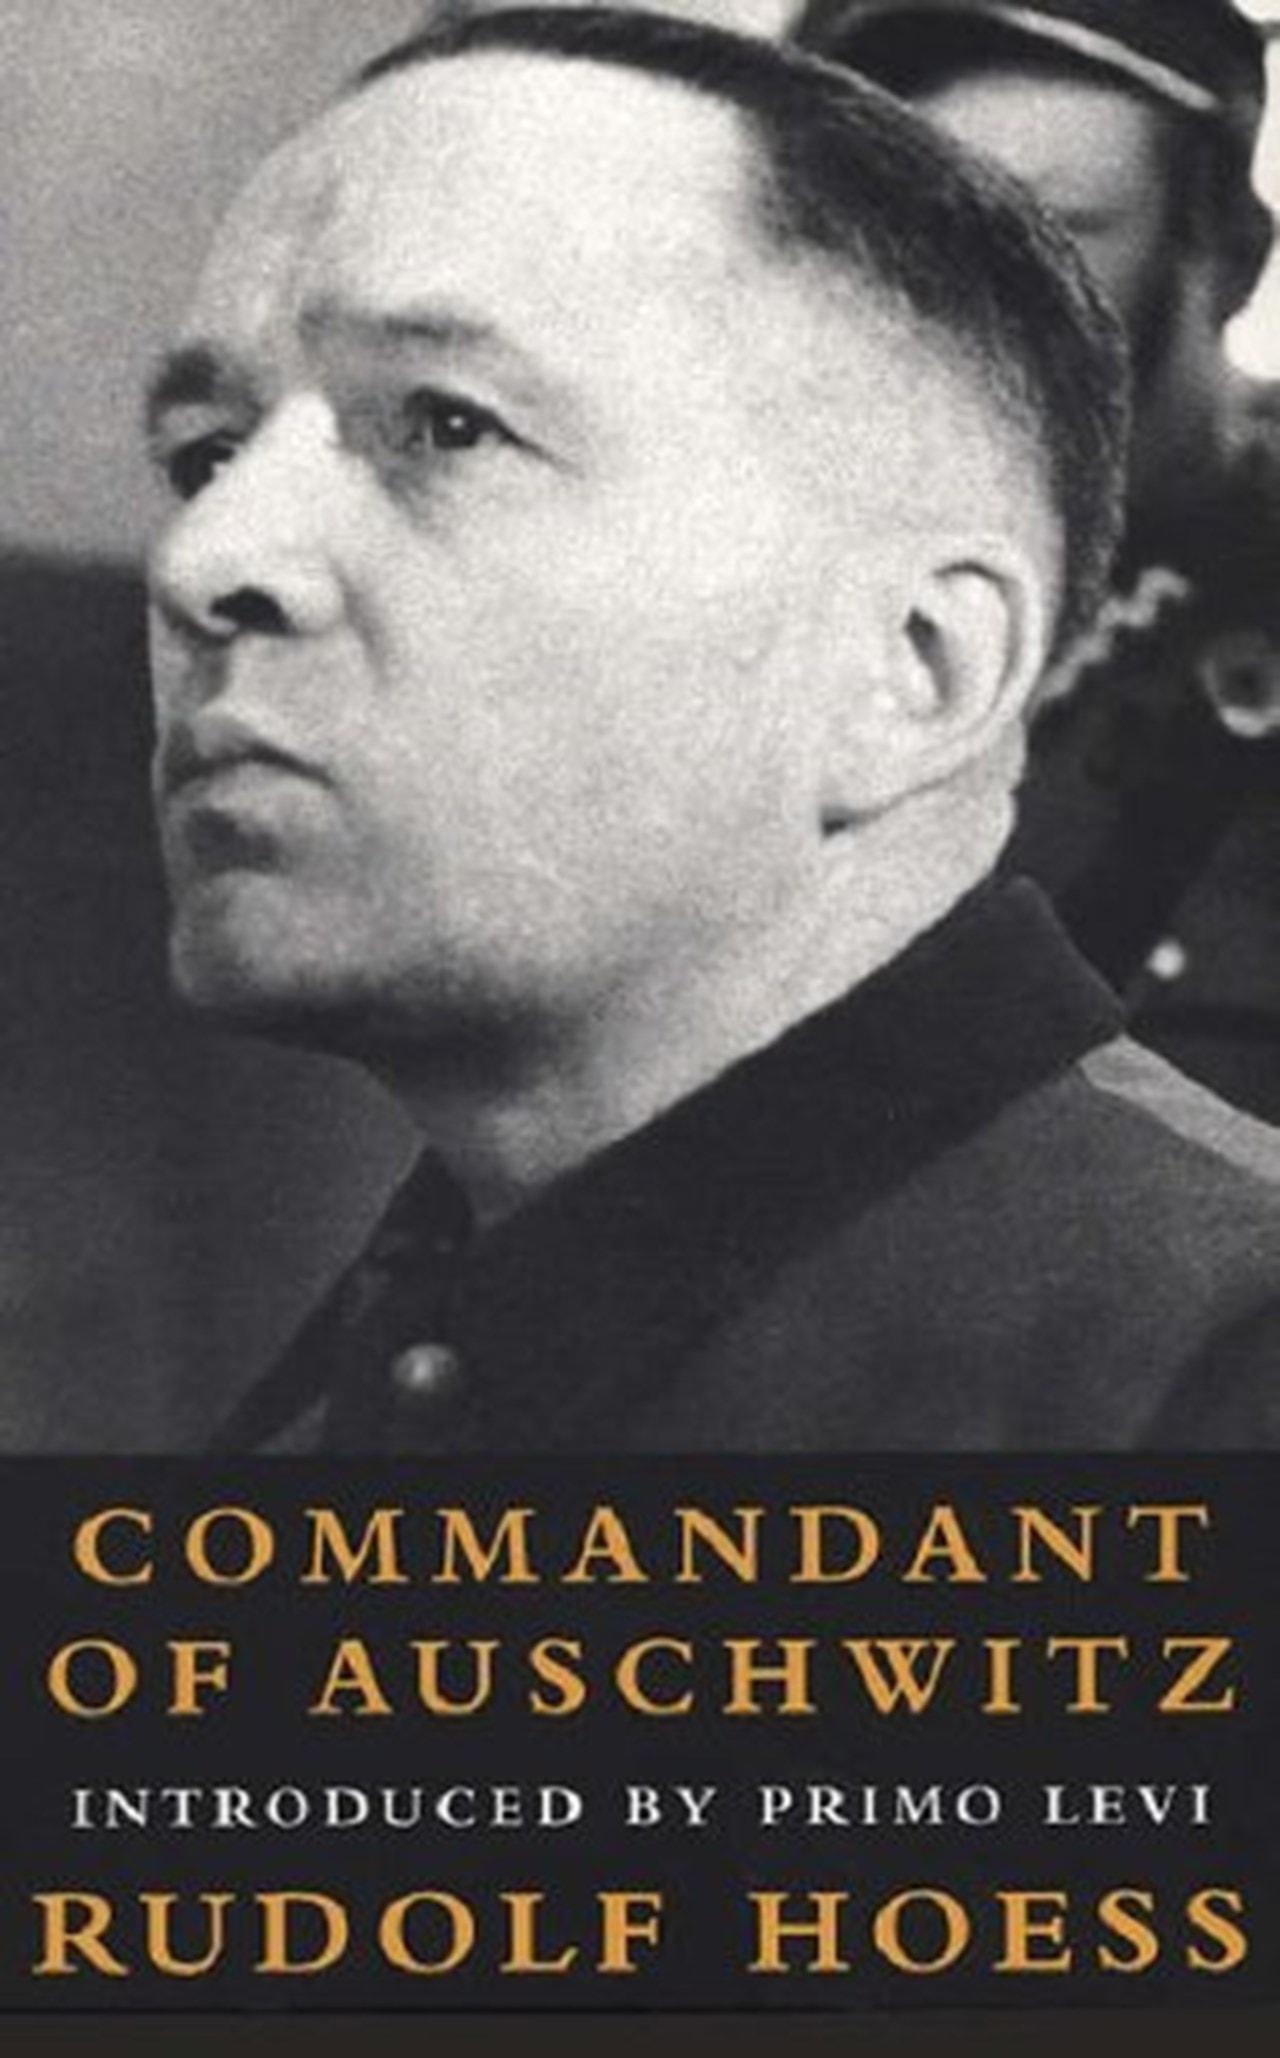 Commandant Of Auschwitz - 1